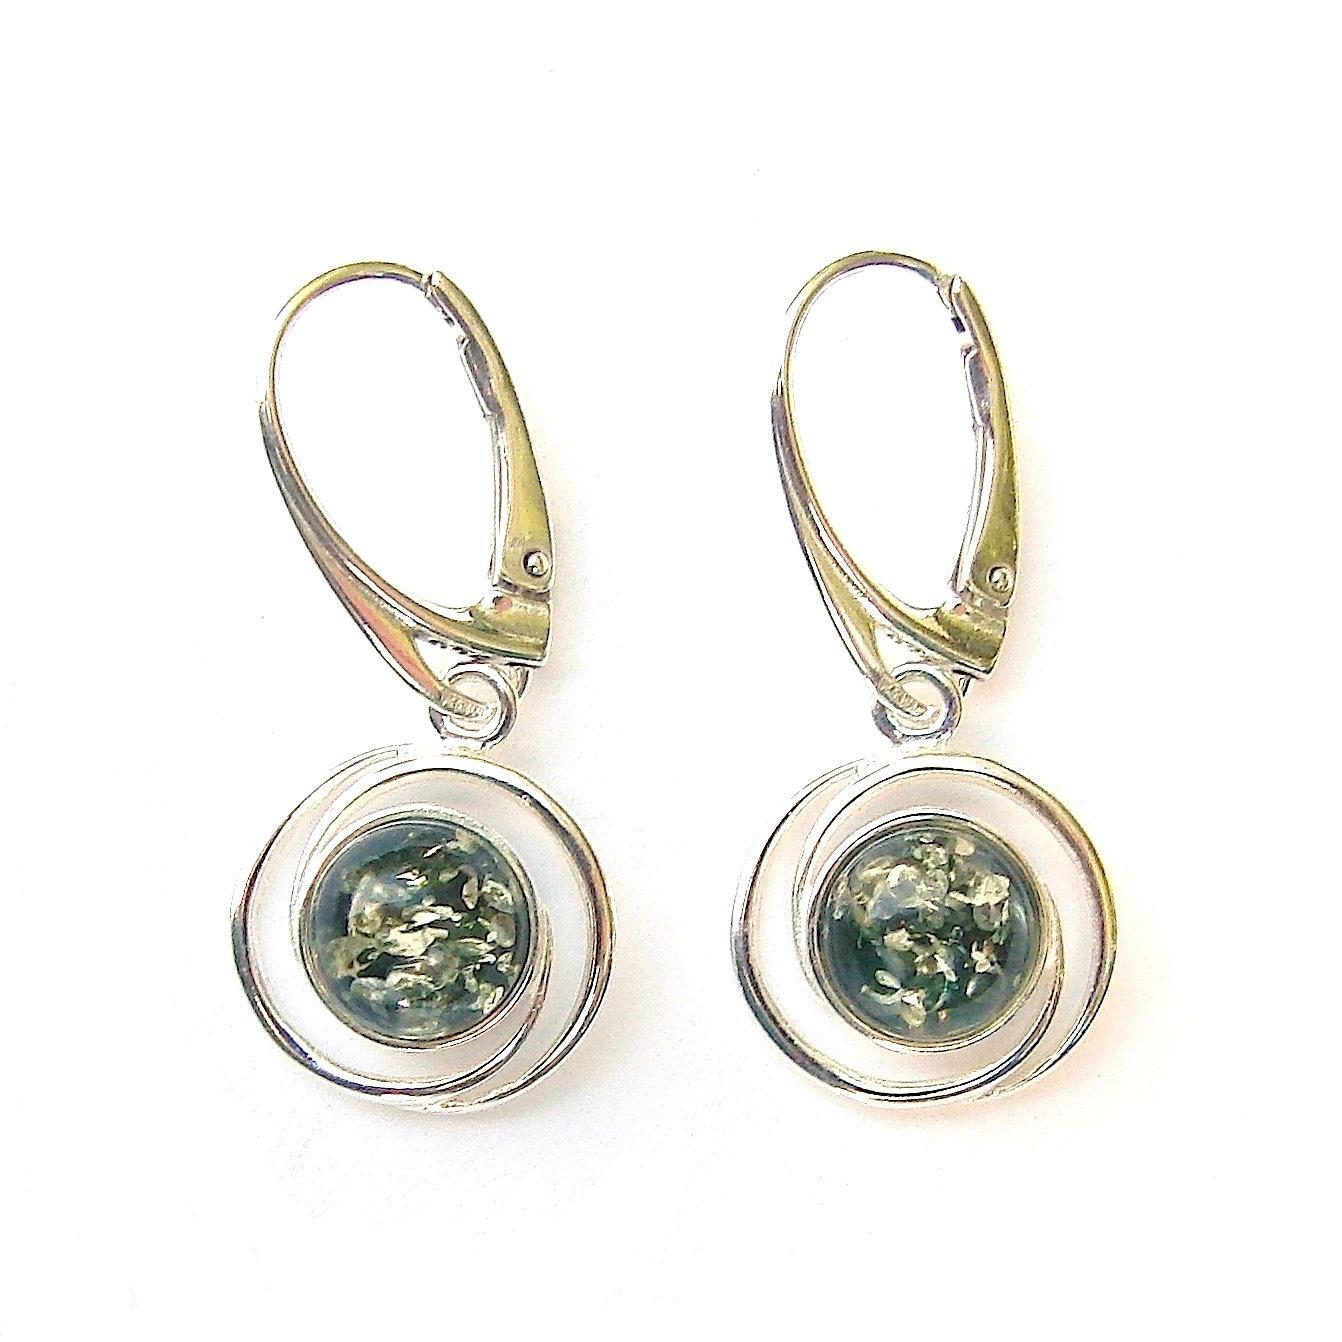 Stunning Green Amber Round Earrings